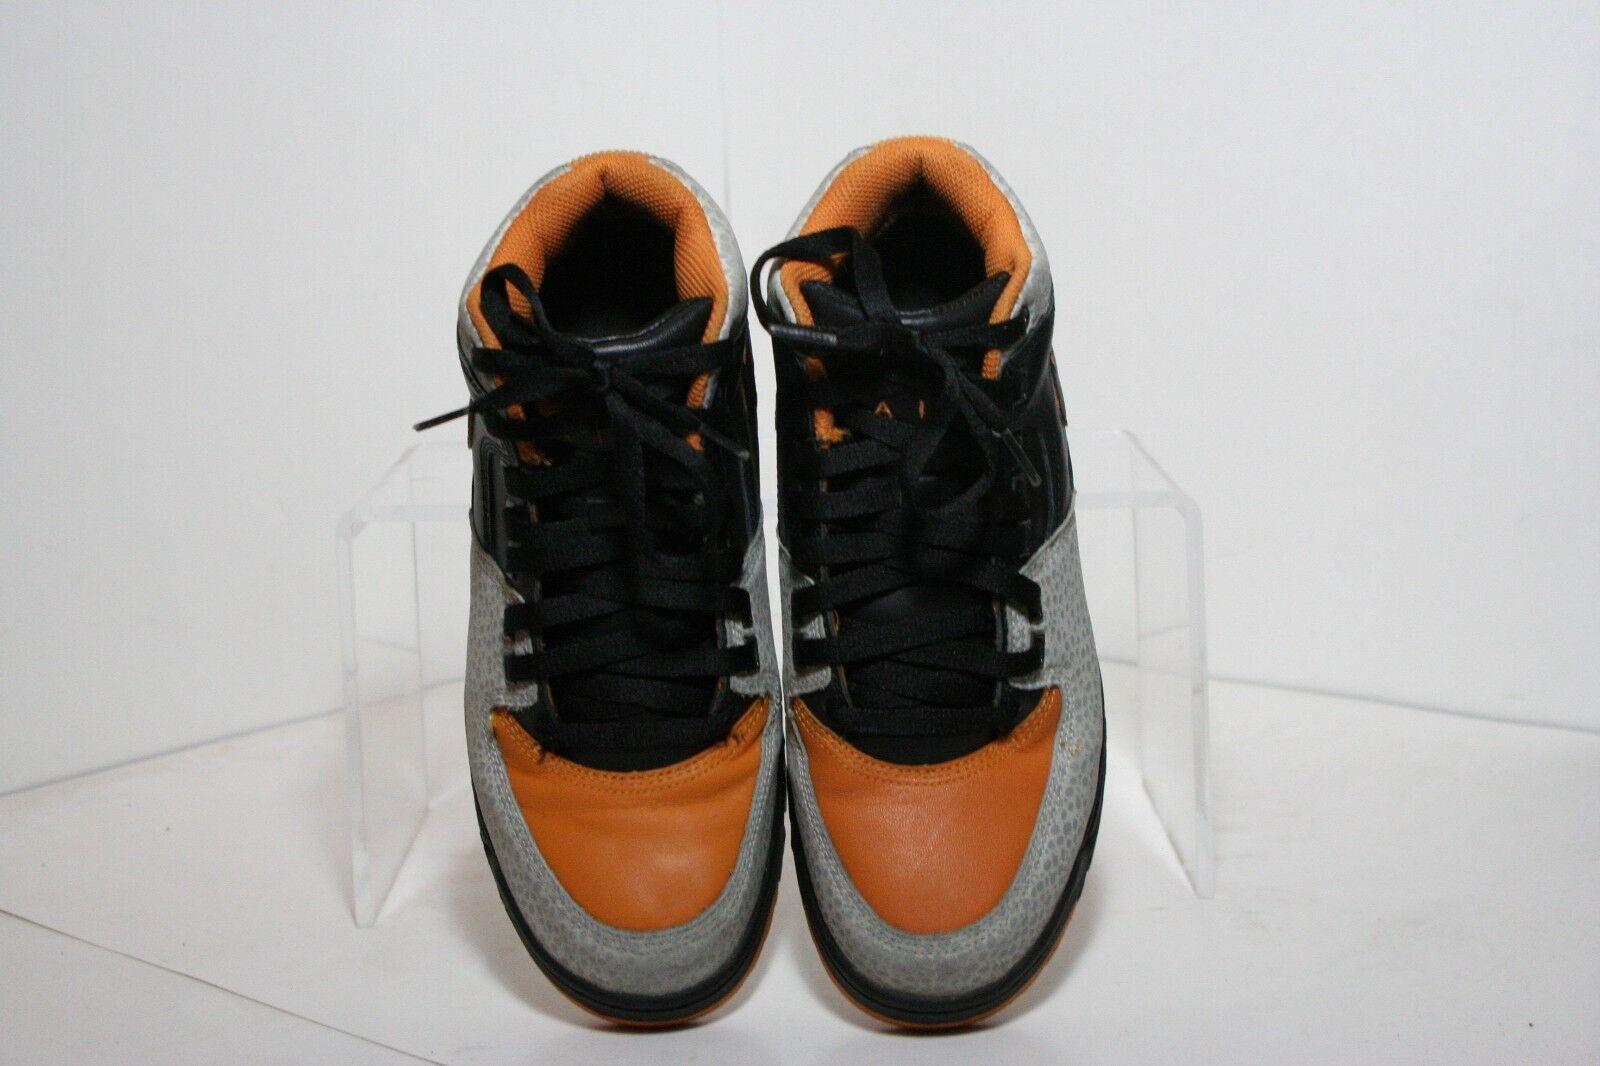 2ed260bd45e8 ... Nike Air Max Worknesh Worknesh Worknesh VTG 2009 High Men 8 Multi  Orange Cement Black Athletic